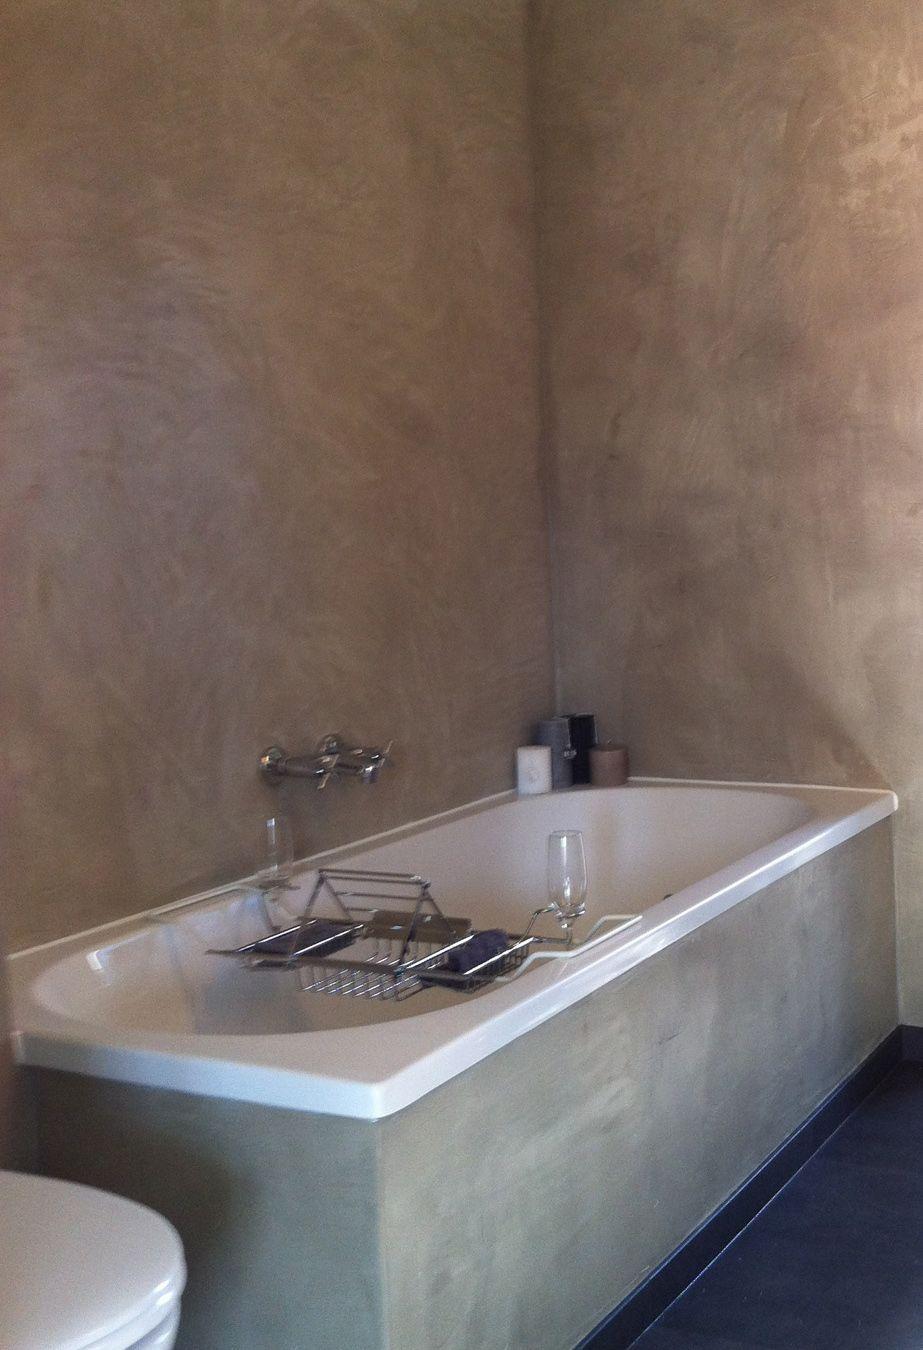 Prachtige betonlook badkamer!   Badkamers   Pinterest